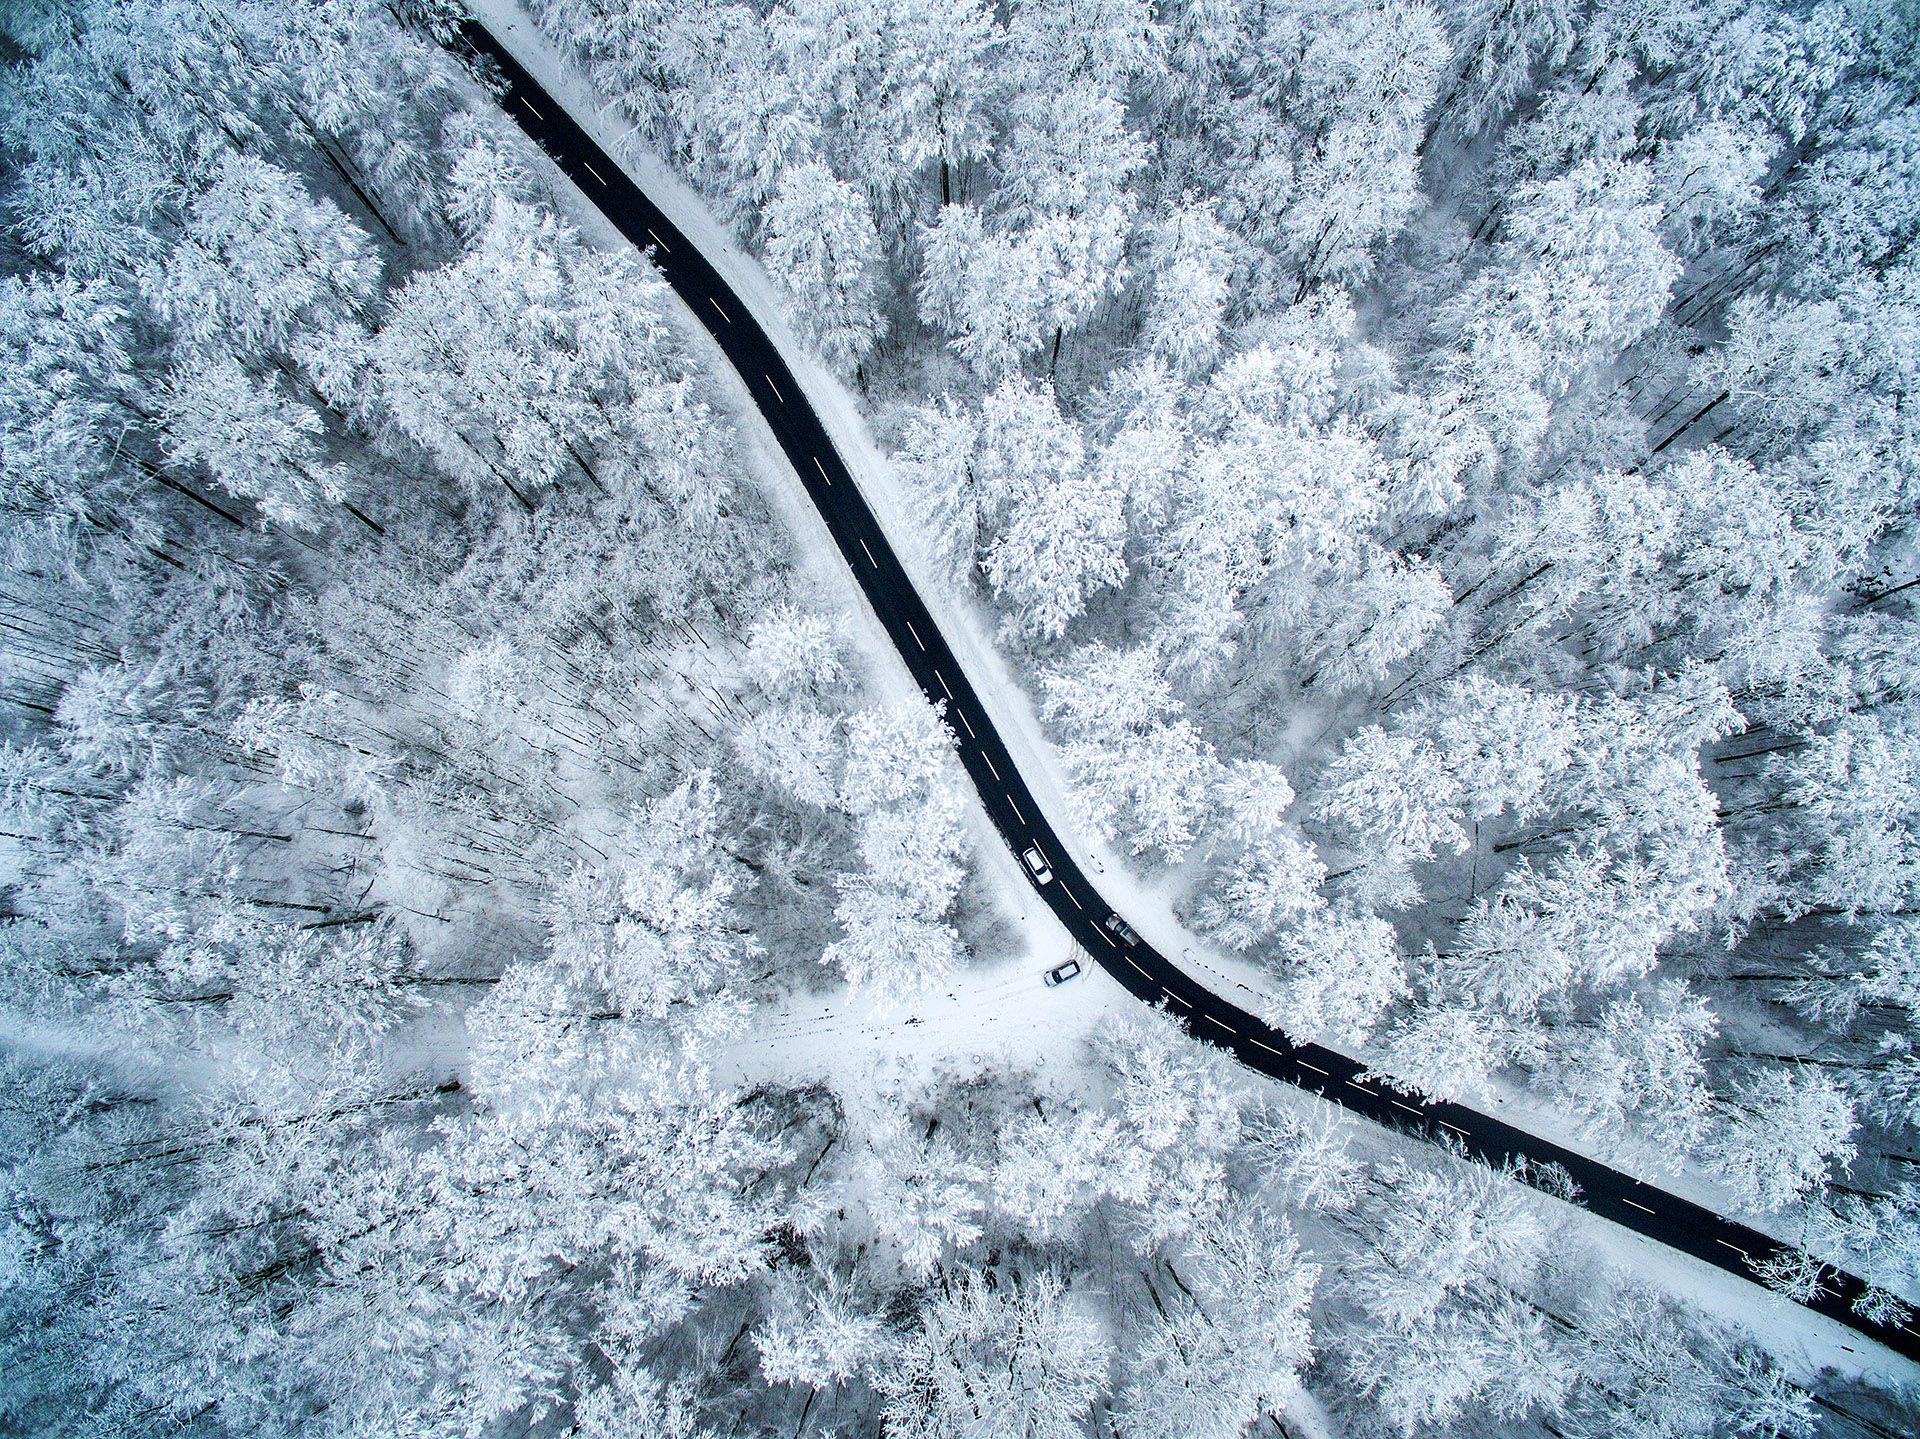 Winter Idyll in Everyday Life